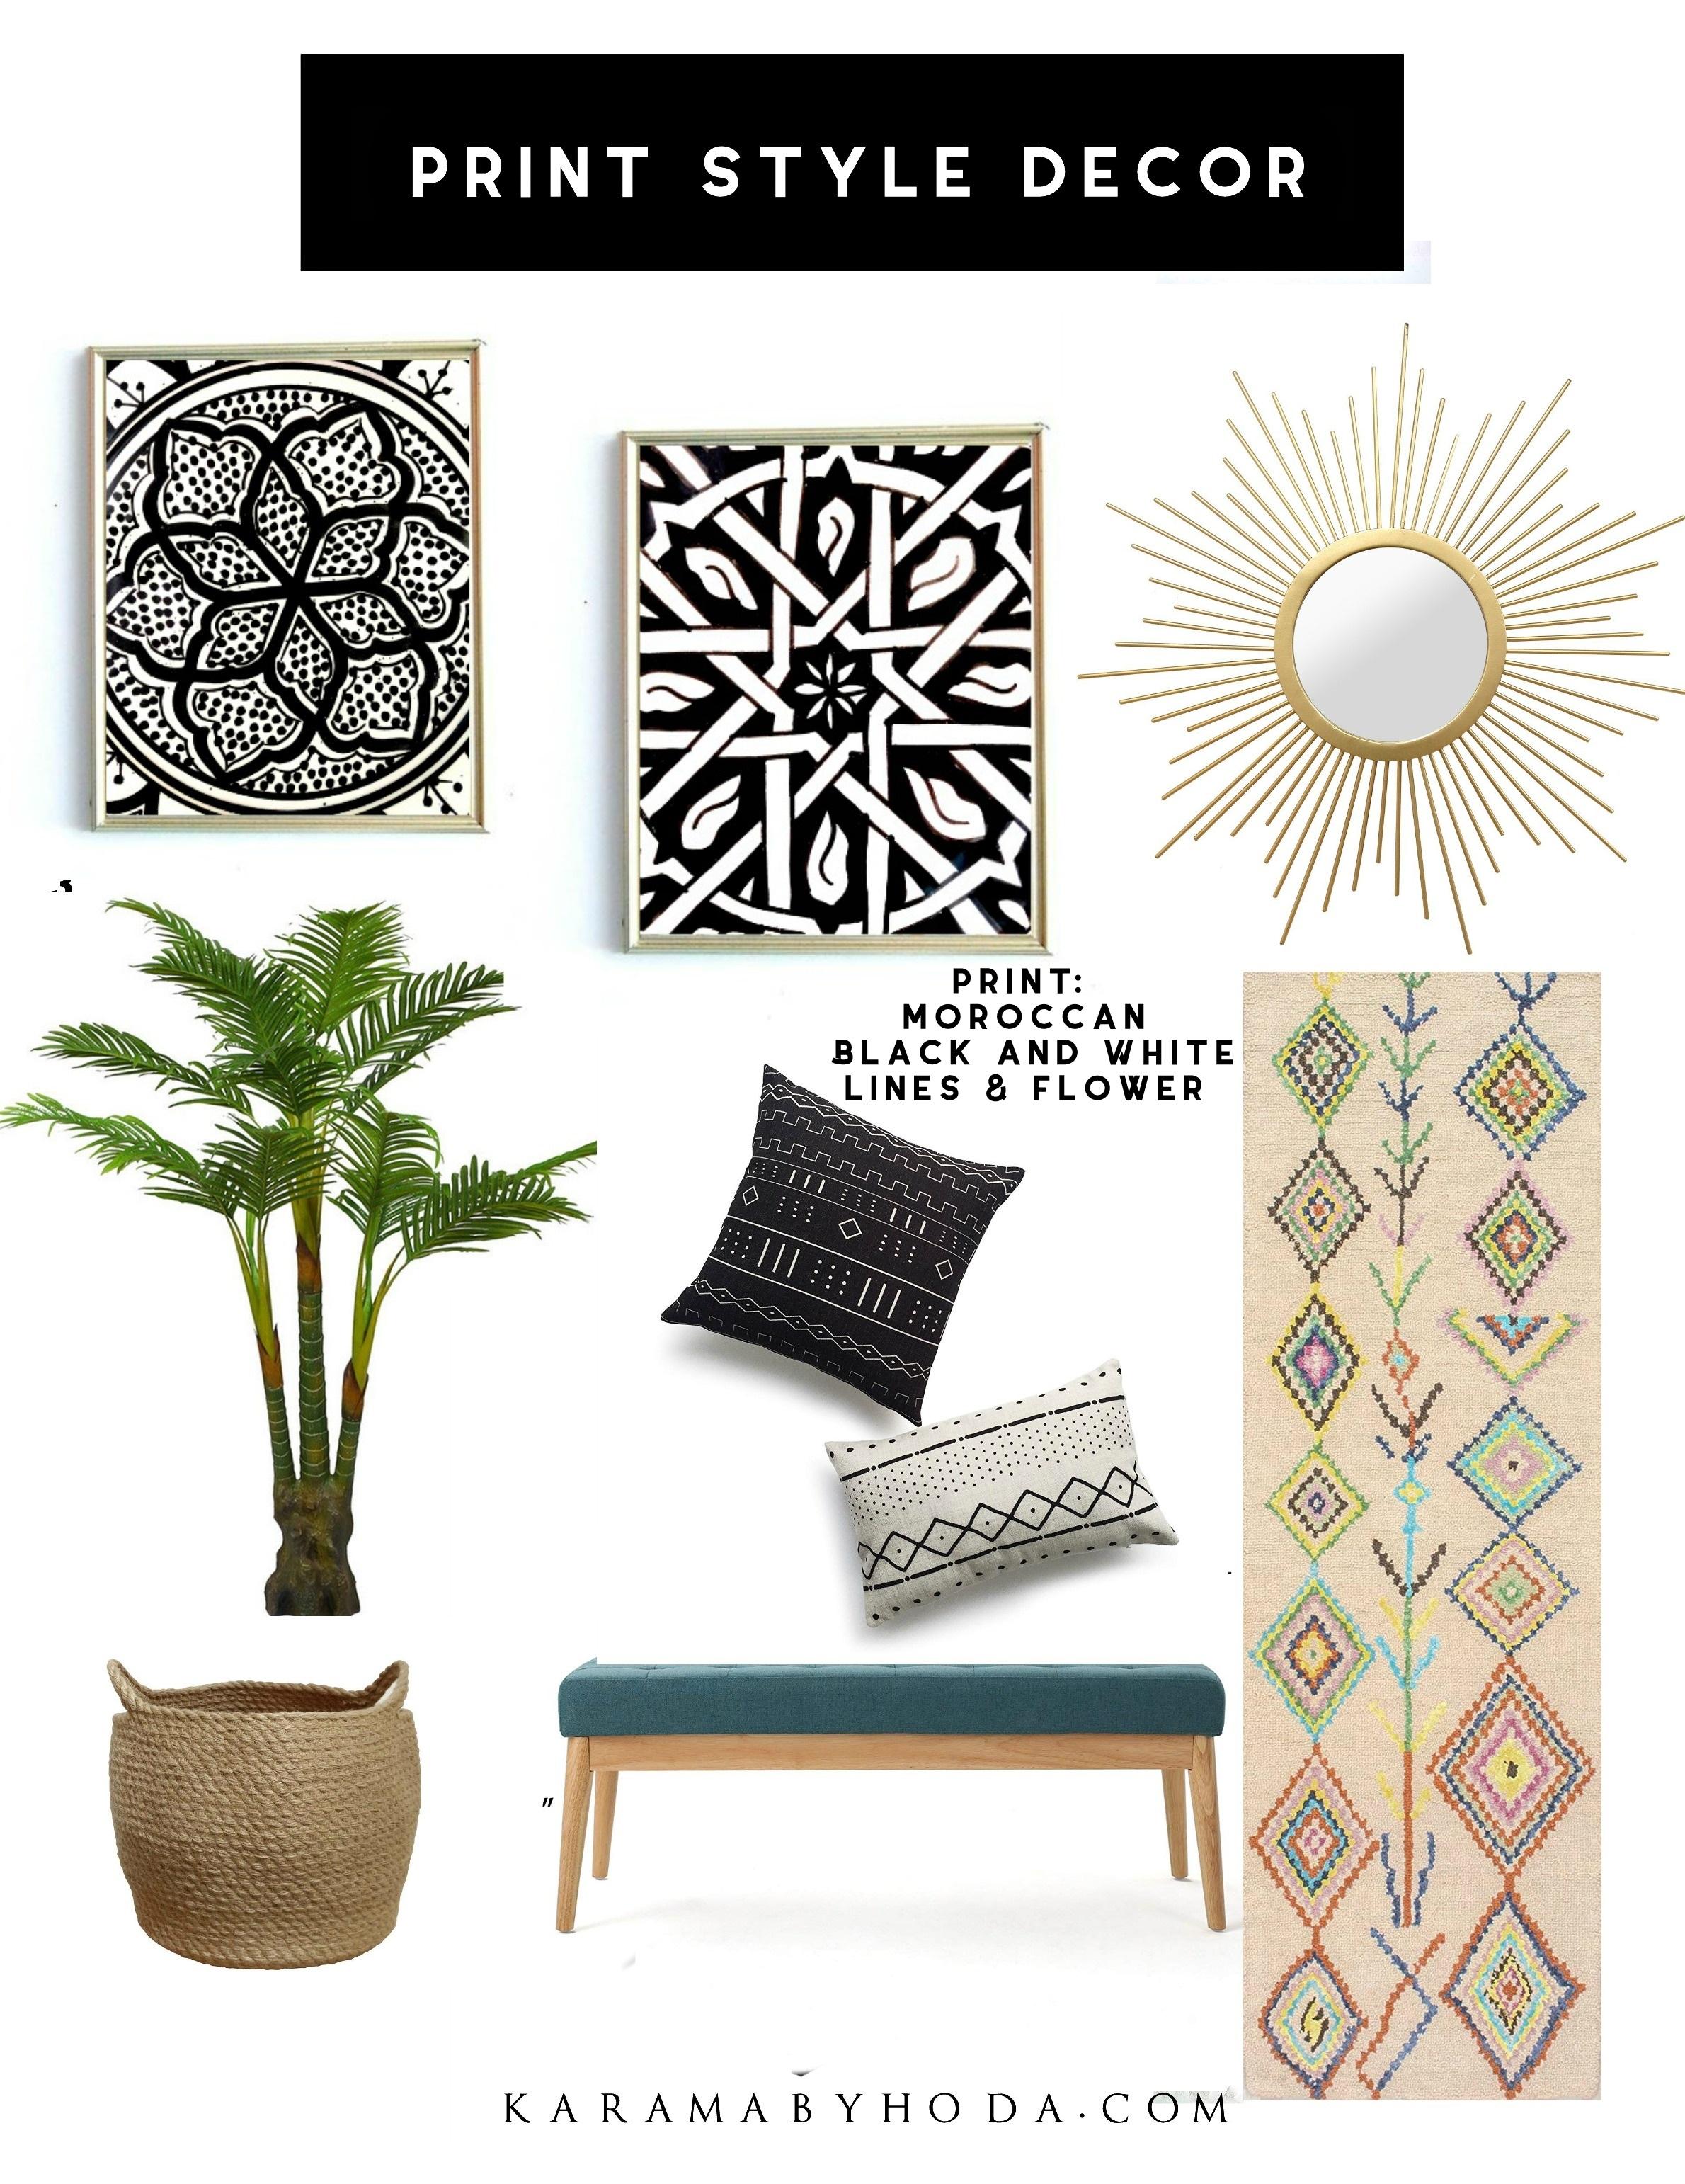 Moroccan Decor Black and White- Print Style Decor- Karama by Hoda.jpg